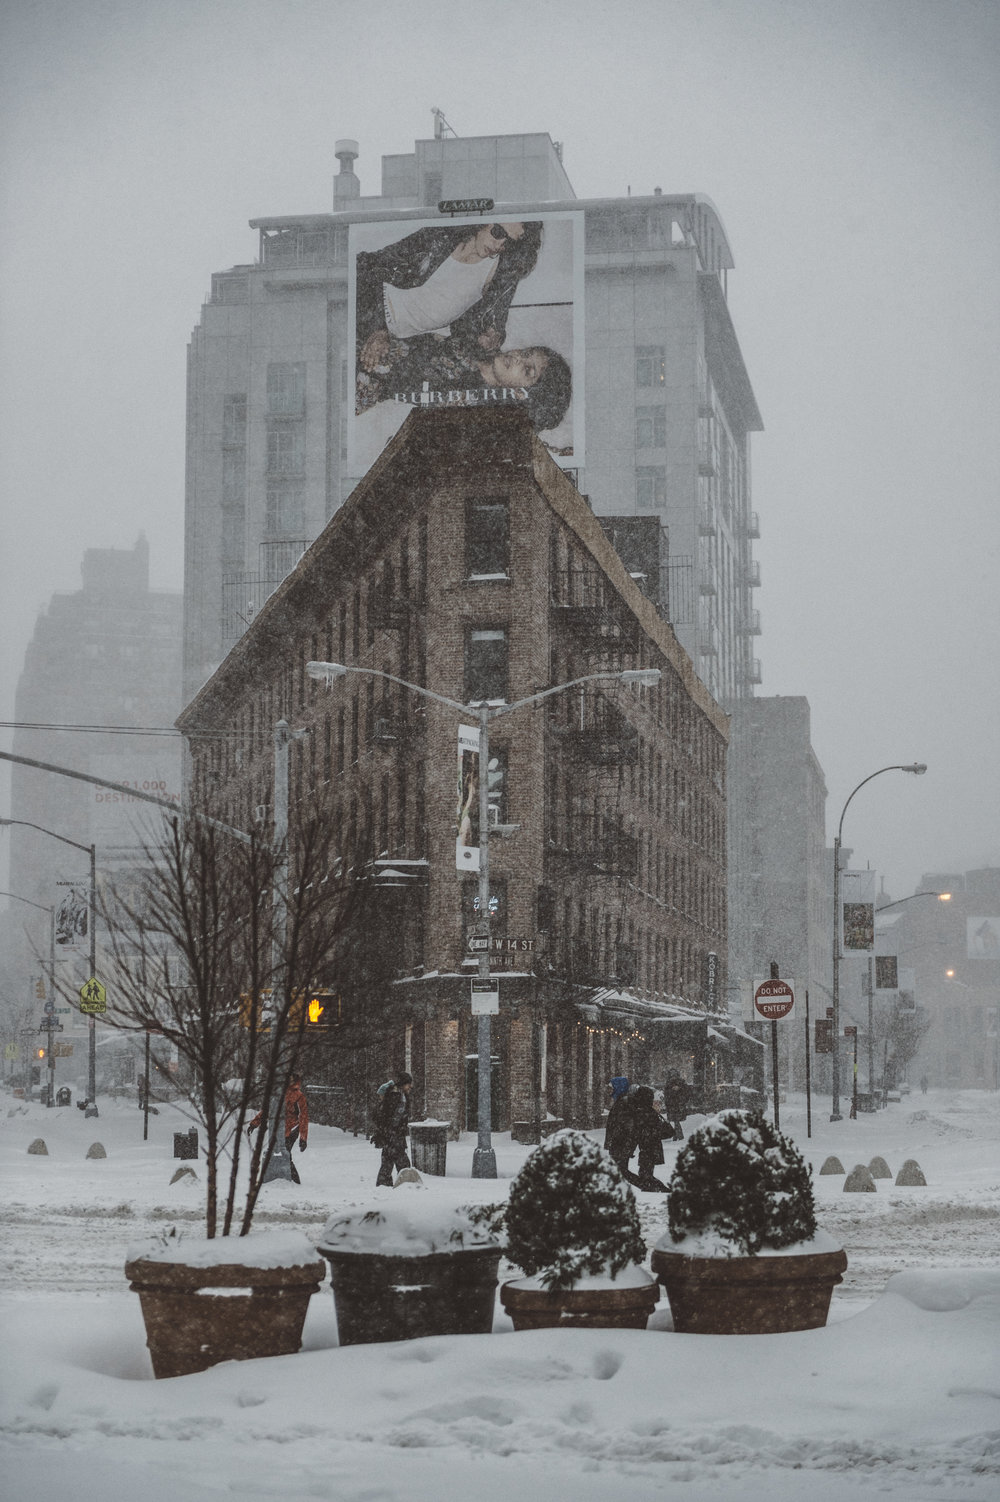 Snowstorm_DSC_1150.jpg